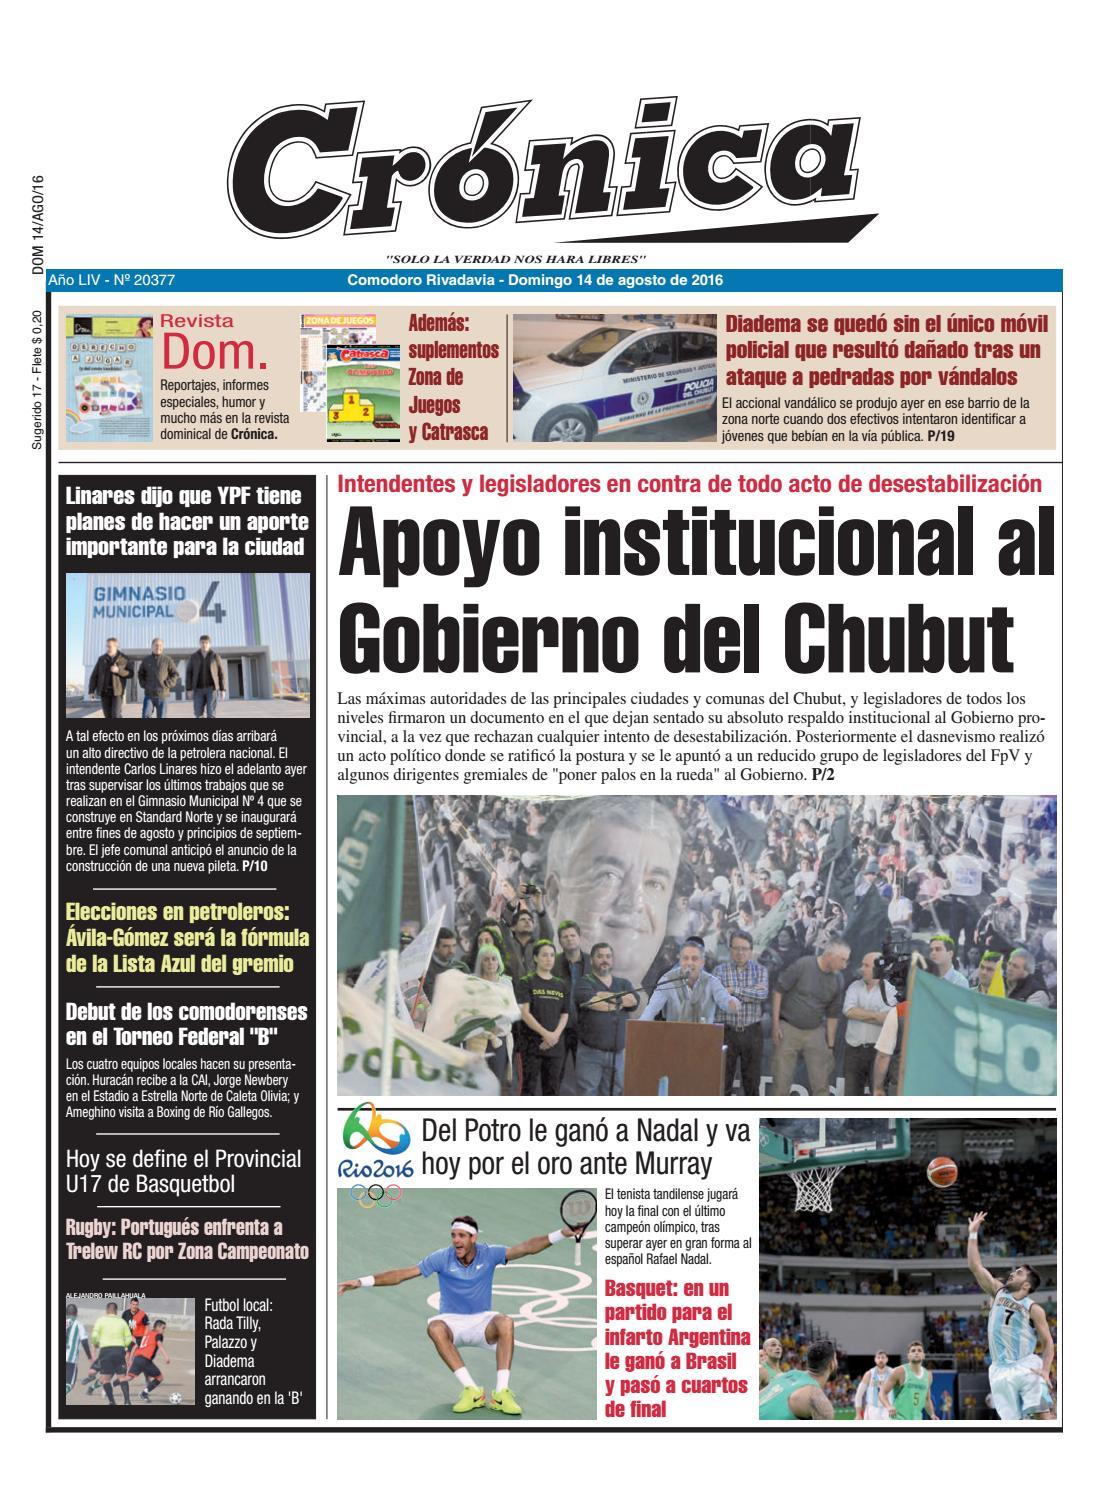 fcc828e79 1e5cb237a8b0a82ae6178221373ac5ed by Diario Crónica - issuu